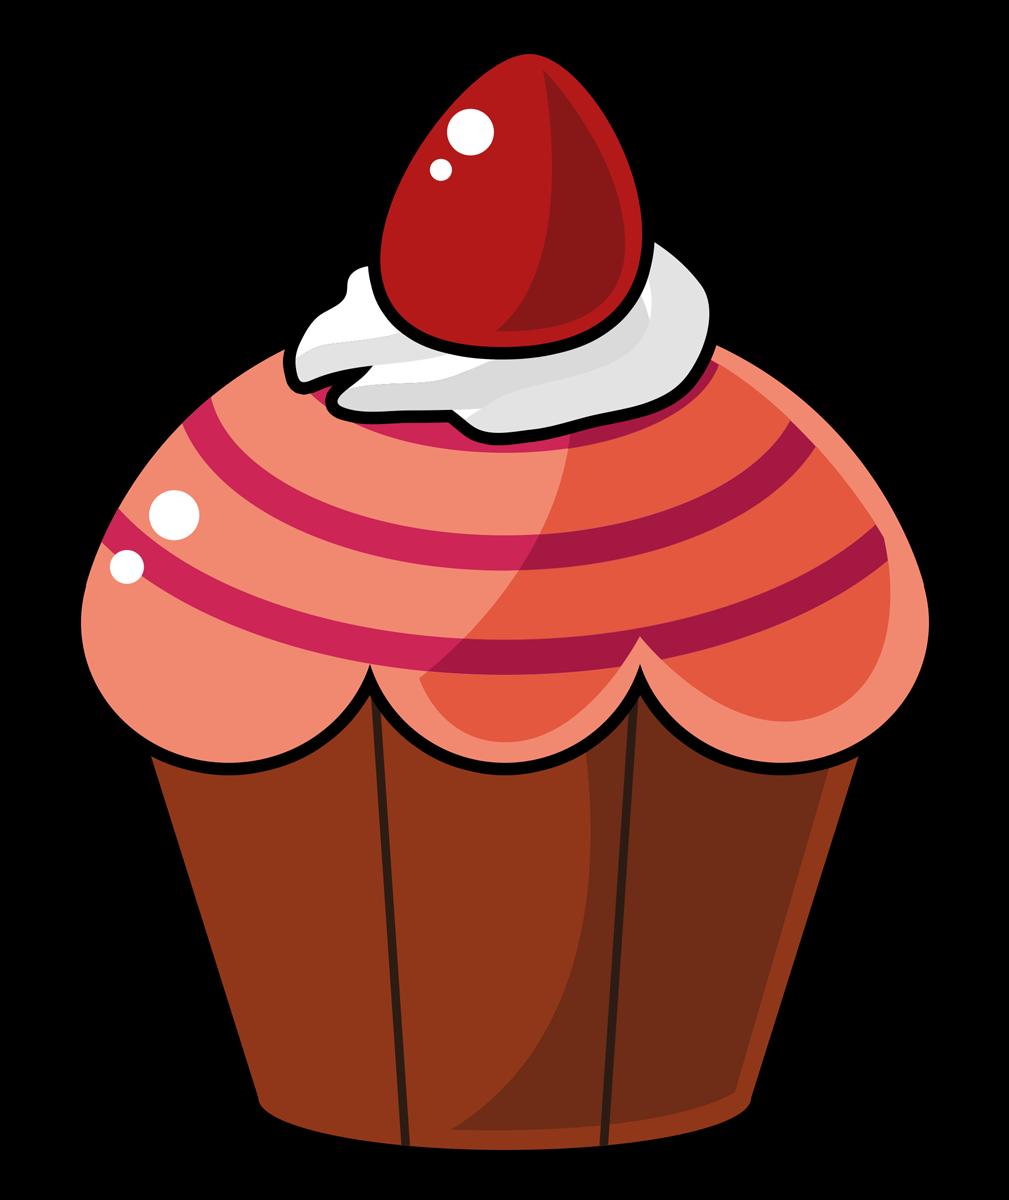 Brownies free download best. Desserts clipart cartoon